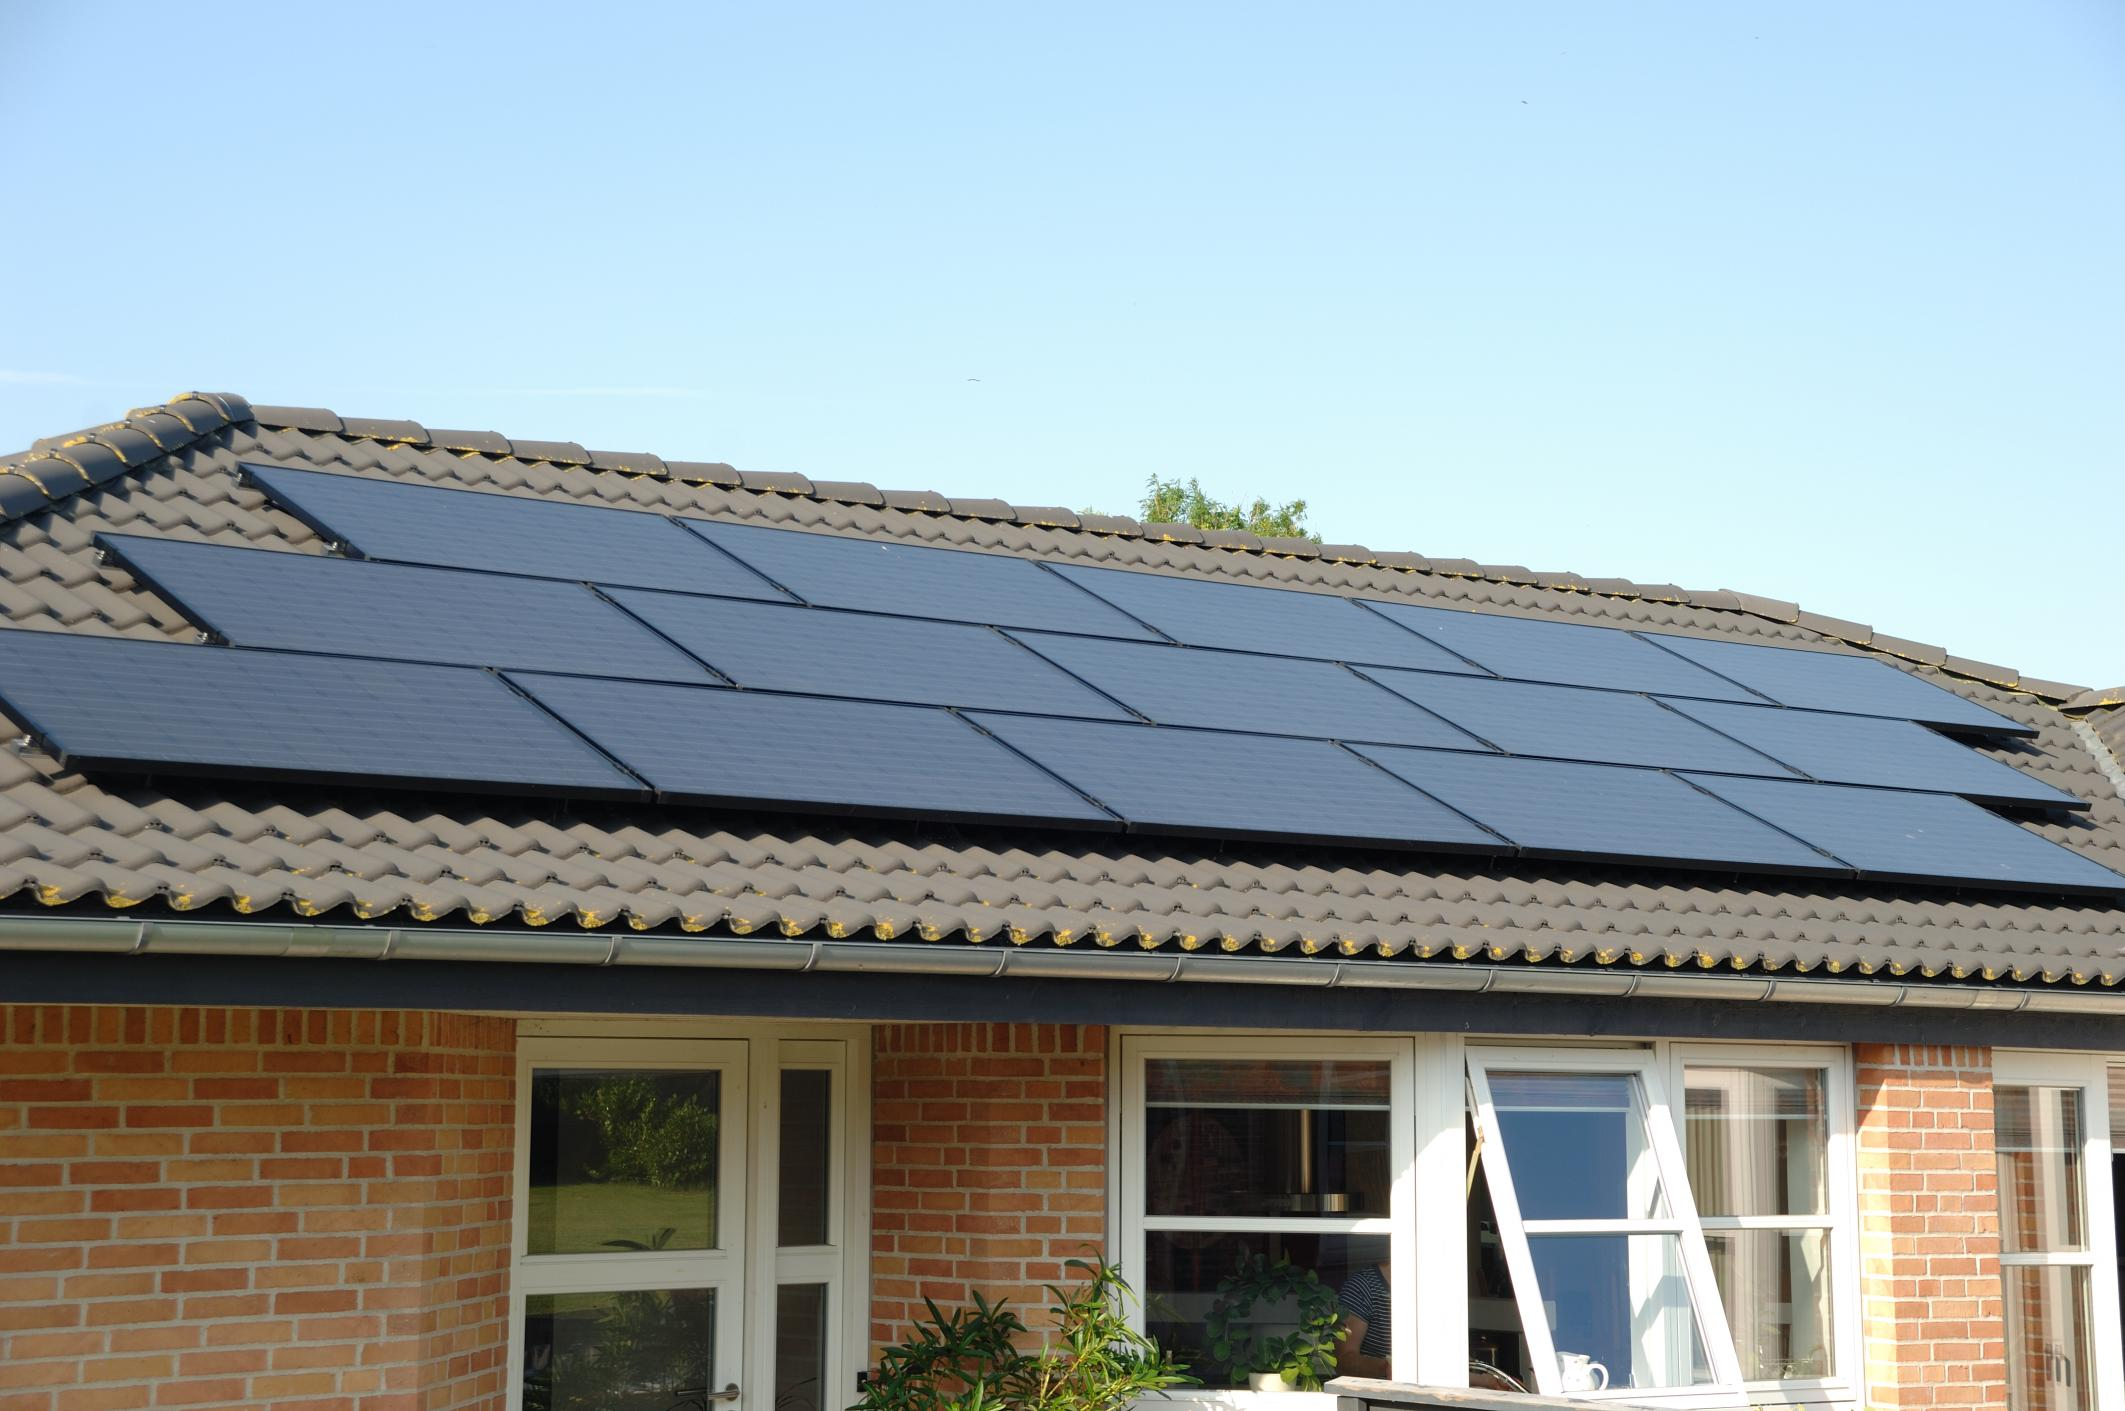 Black solar panels on a house